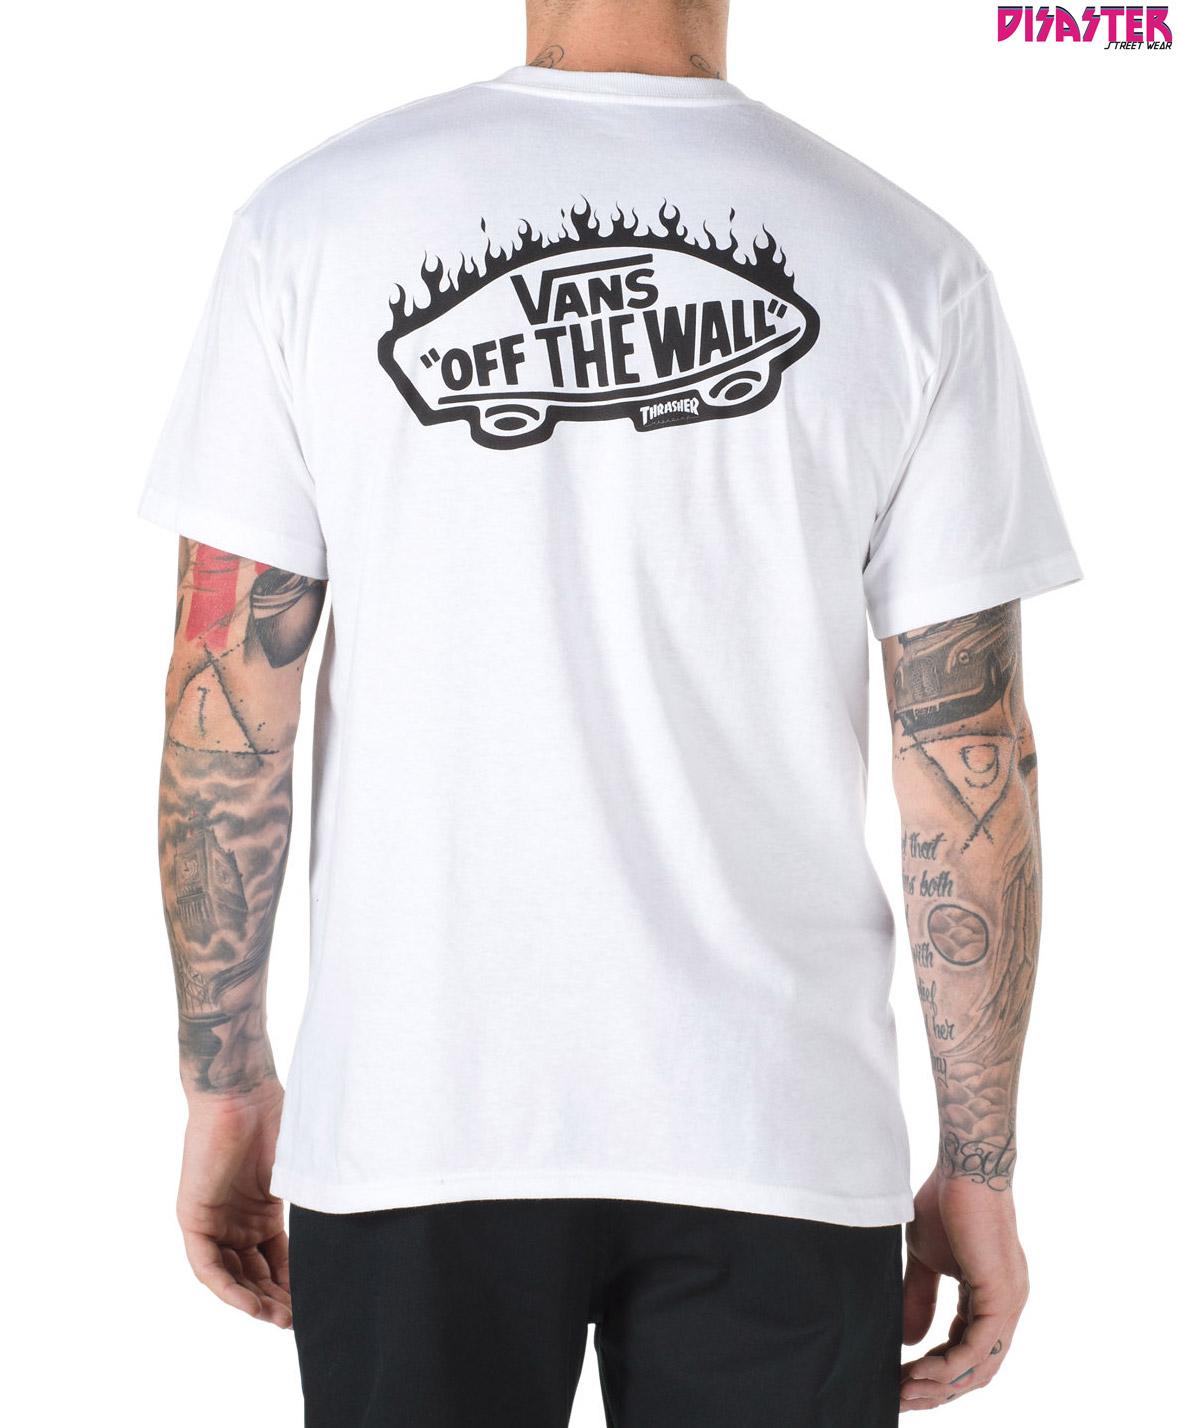 Camiseta para niño Vans By Thrasher White 0ffcaeb8906